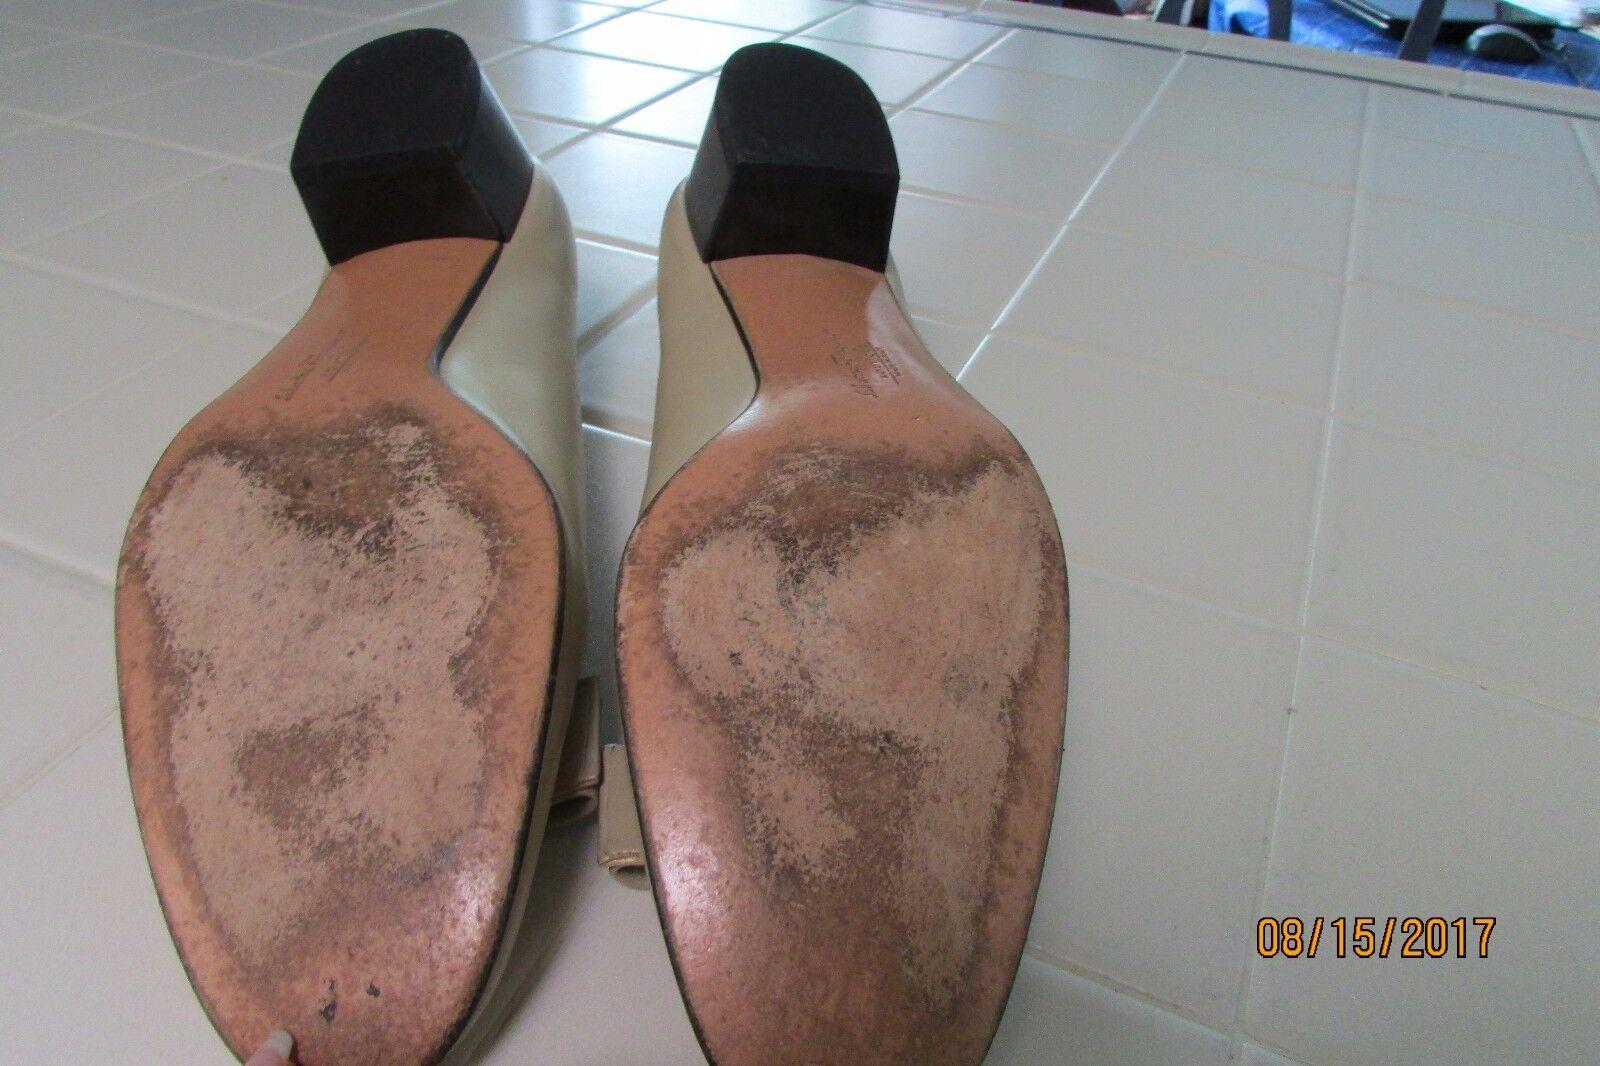 Salvatore Ferragamo Closed shoes, 9 1/2